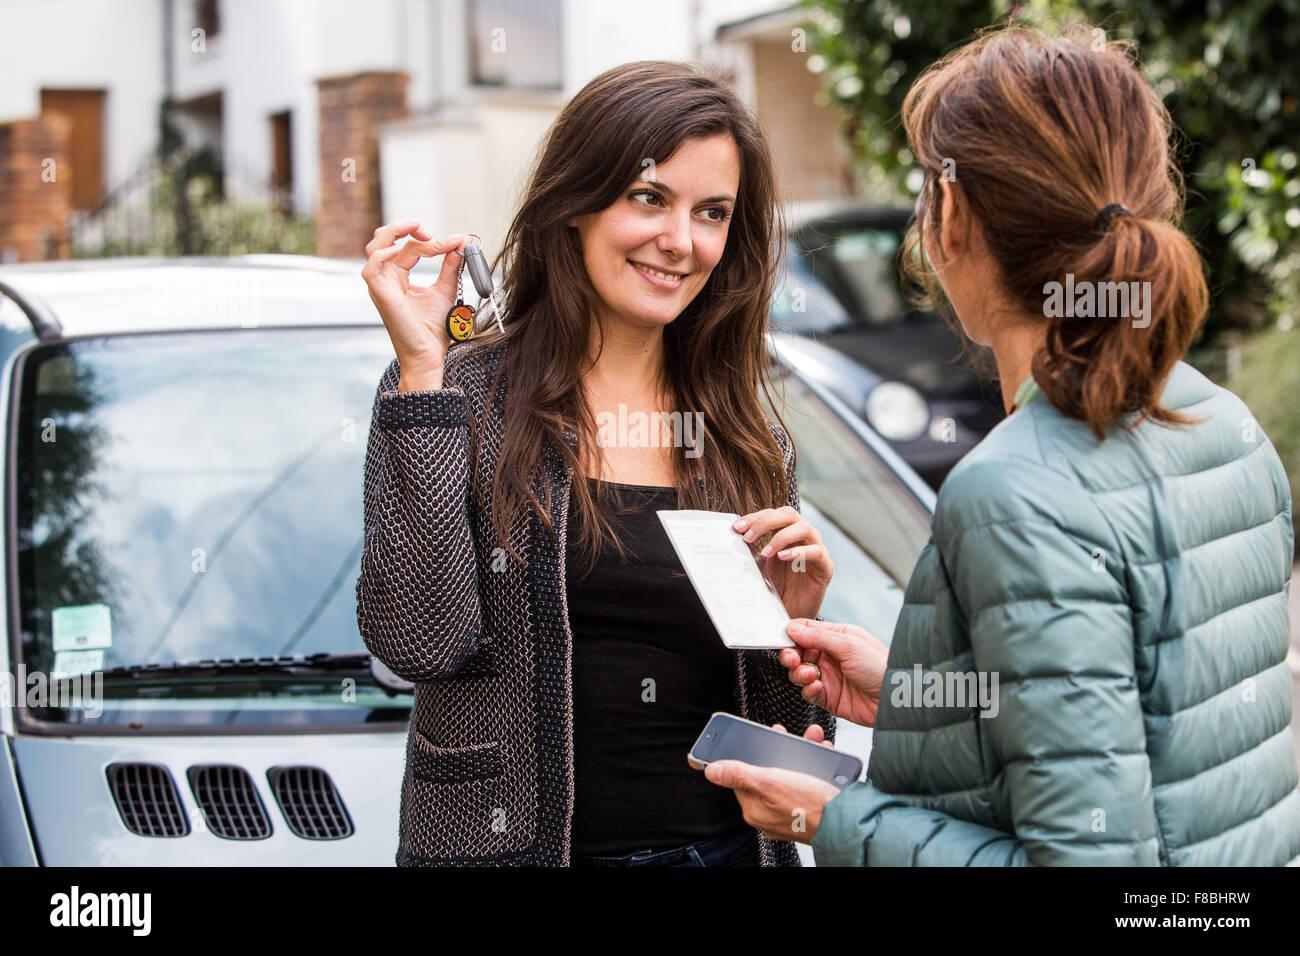 Car rental between individuals. - Stock Image